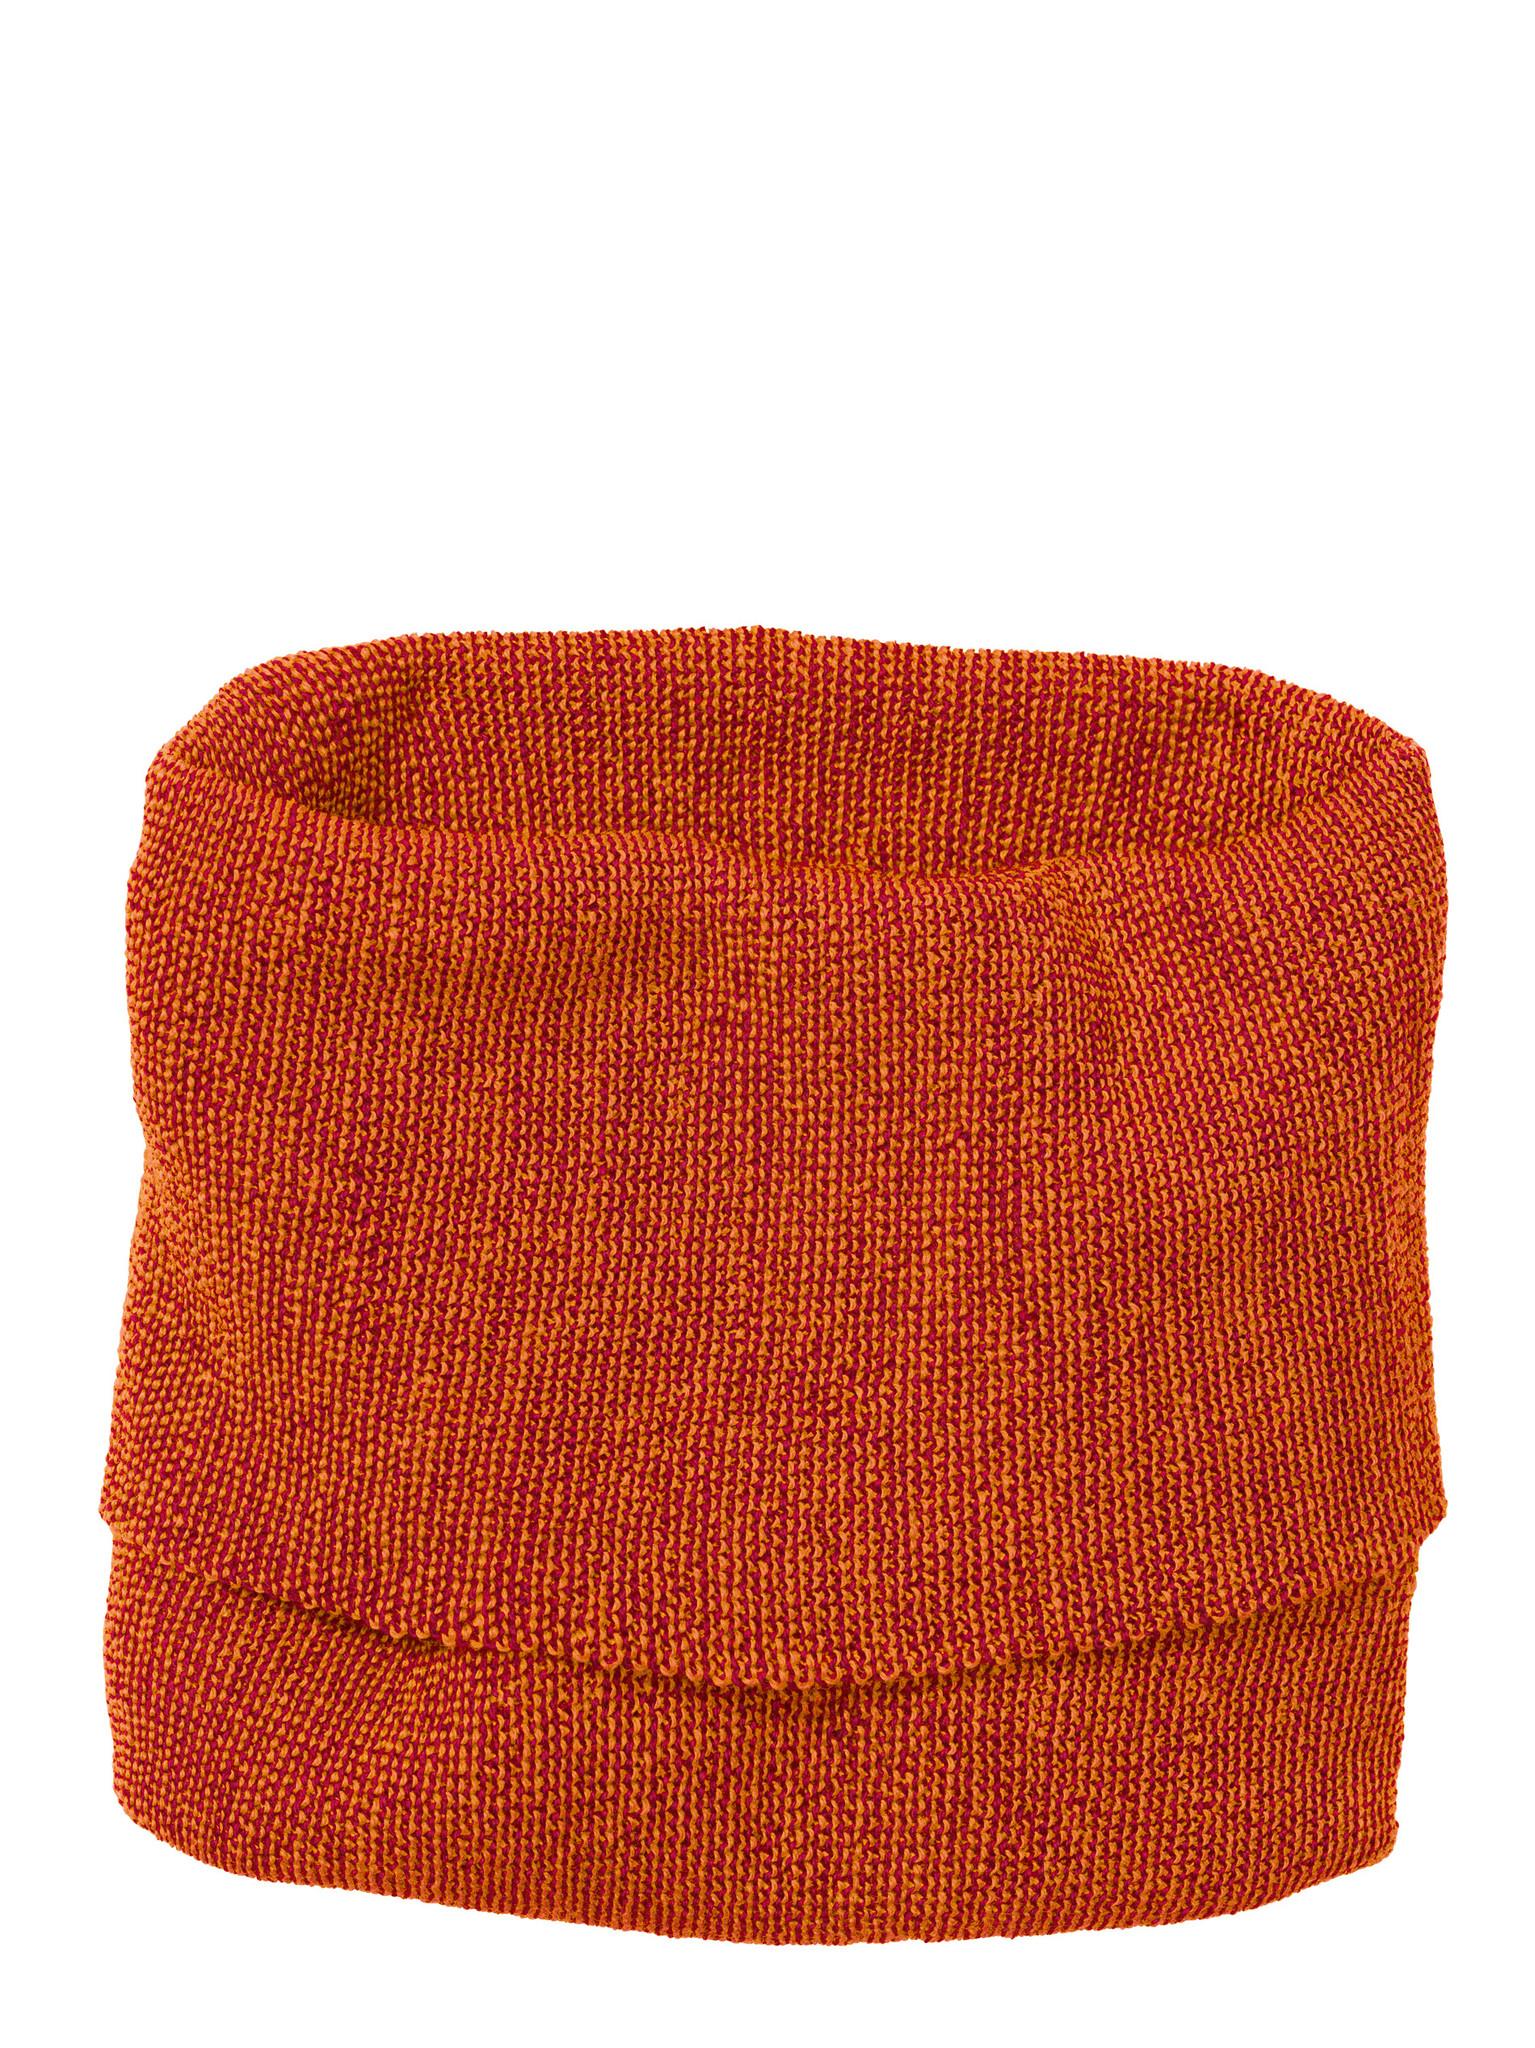 Disana Disana Tube scarf -100% wol - Orange/Bordeaux (973)